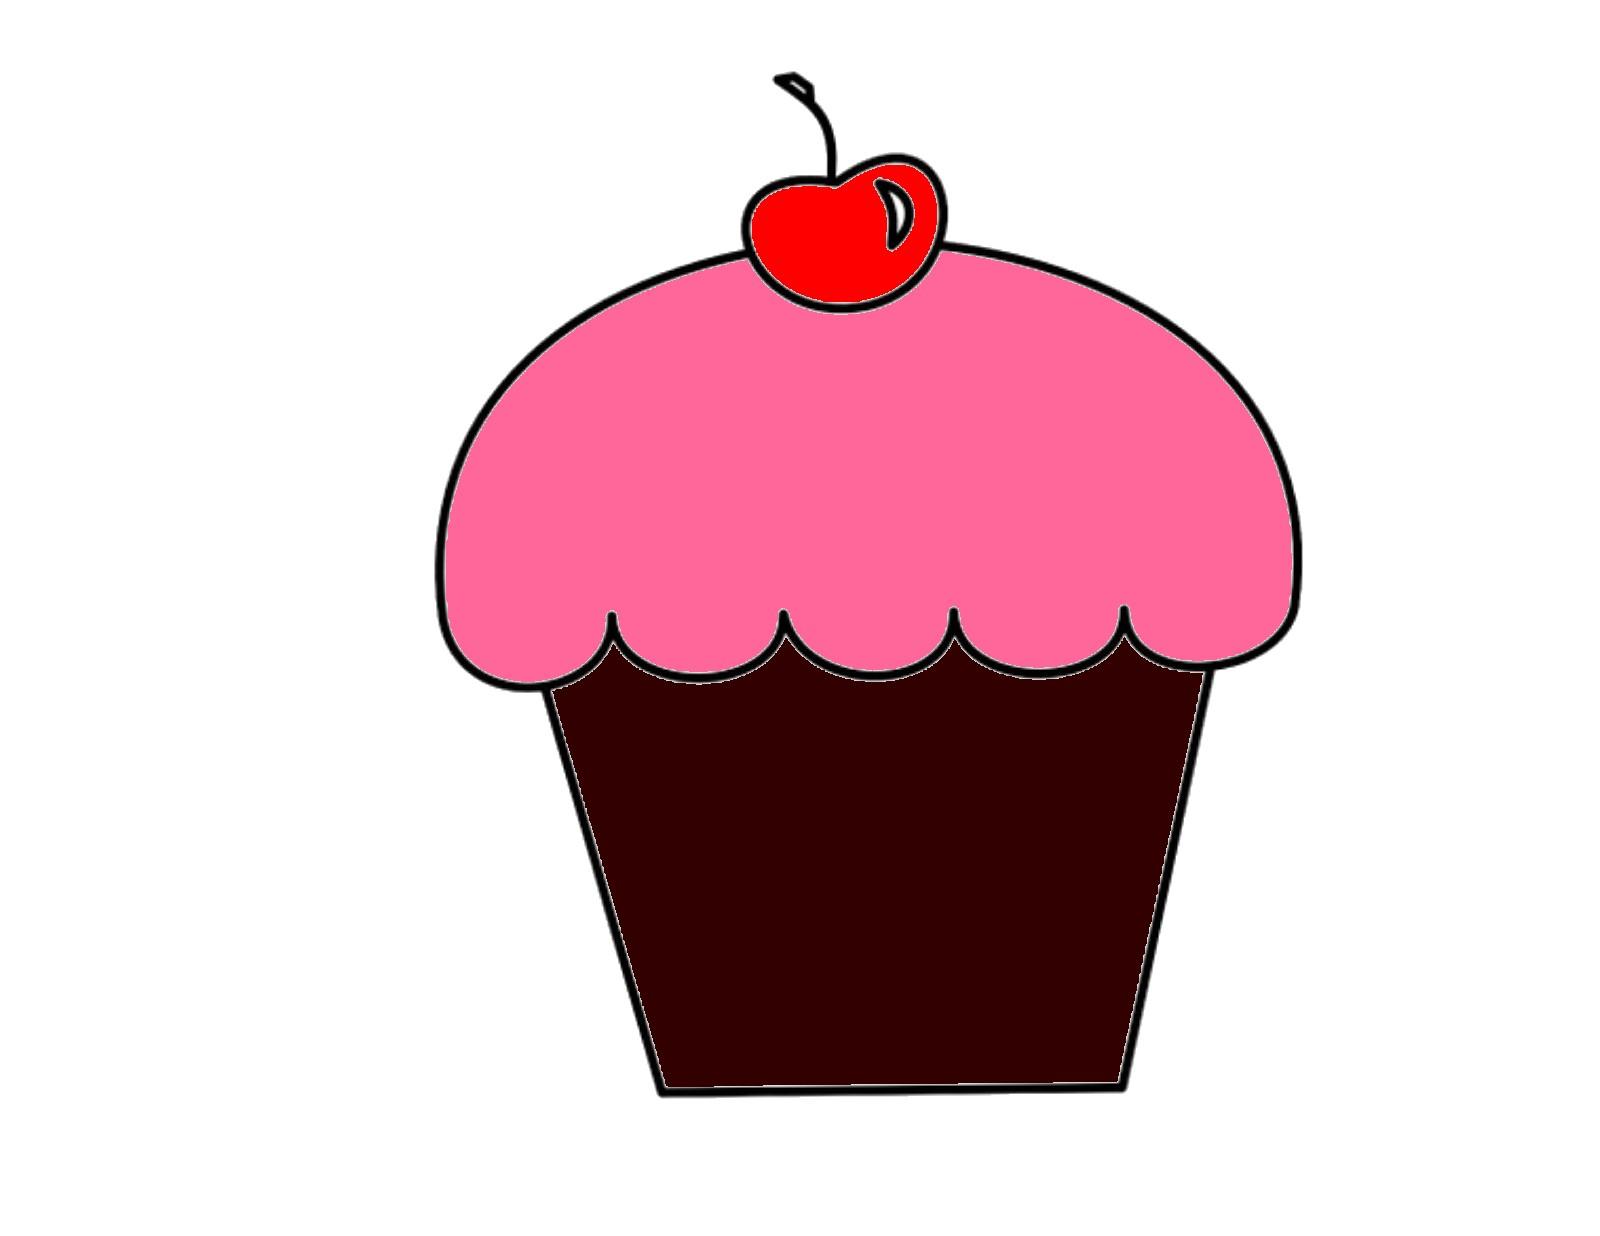 Cupcake | Free Images at Clker.com - vector clip art ... Cartoon Cupcakes Clipart